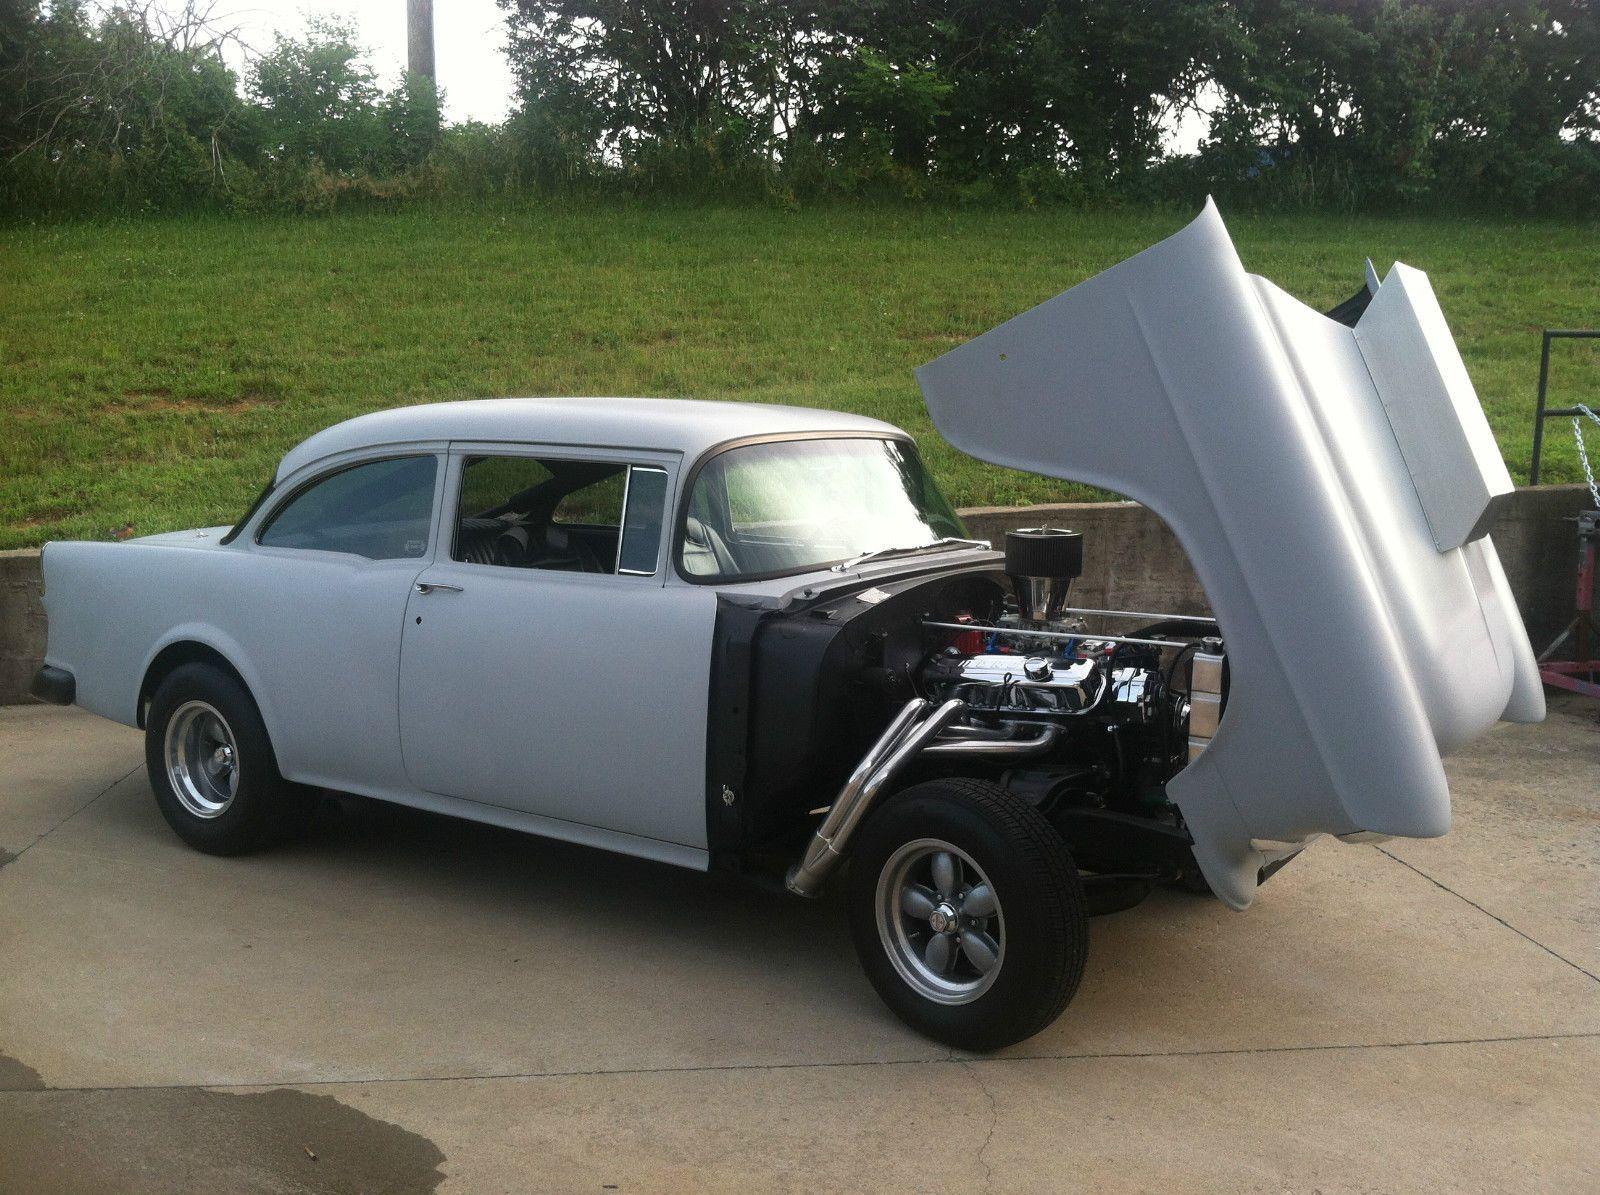 Chevrolet Bel Air 150 210 Two Lane Blacktop Gasser | eBay | 1955 ...